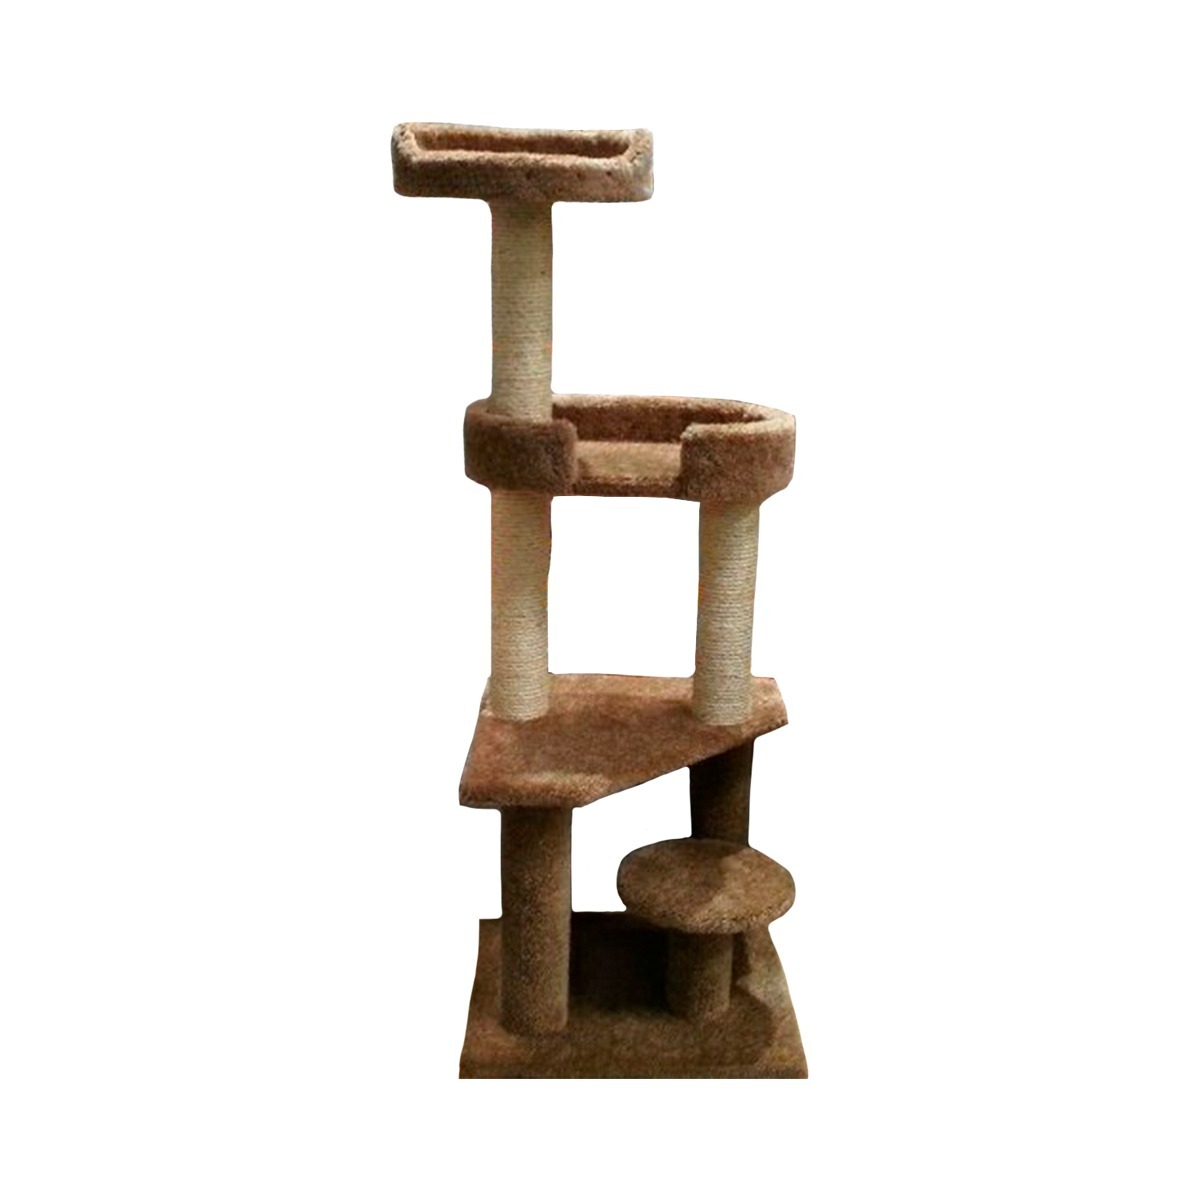 Mueble rascador para gatos rbol 3 pisos 1 en - Mueble arenero para gatos ...